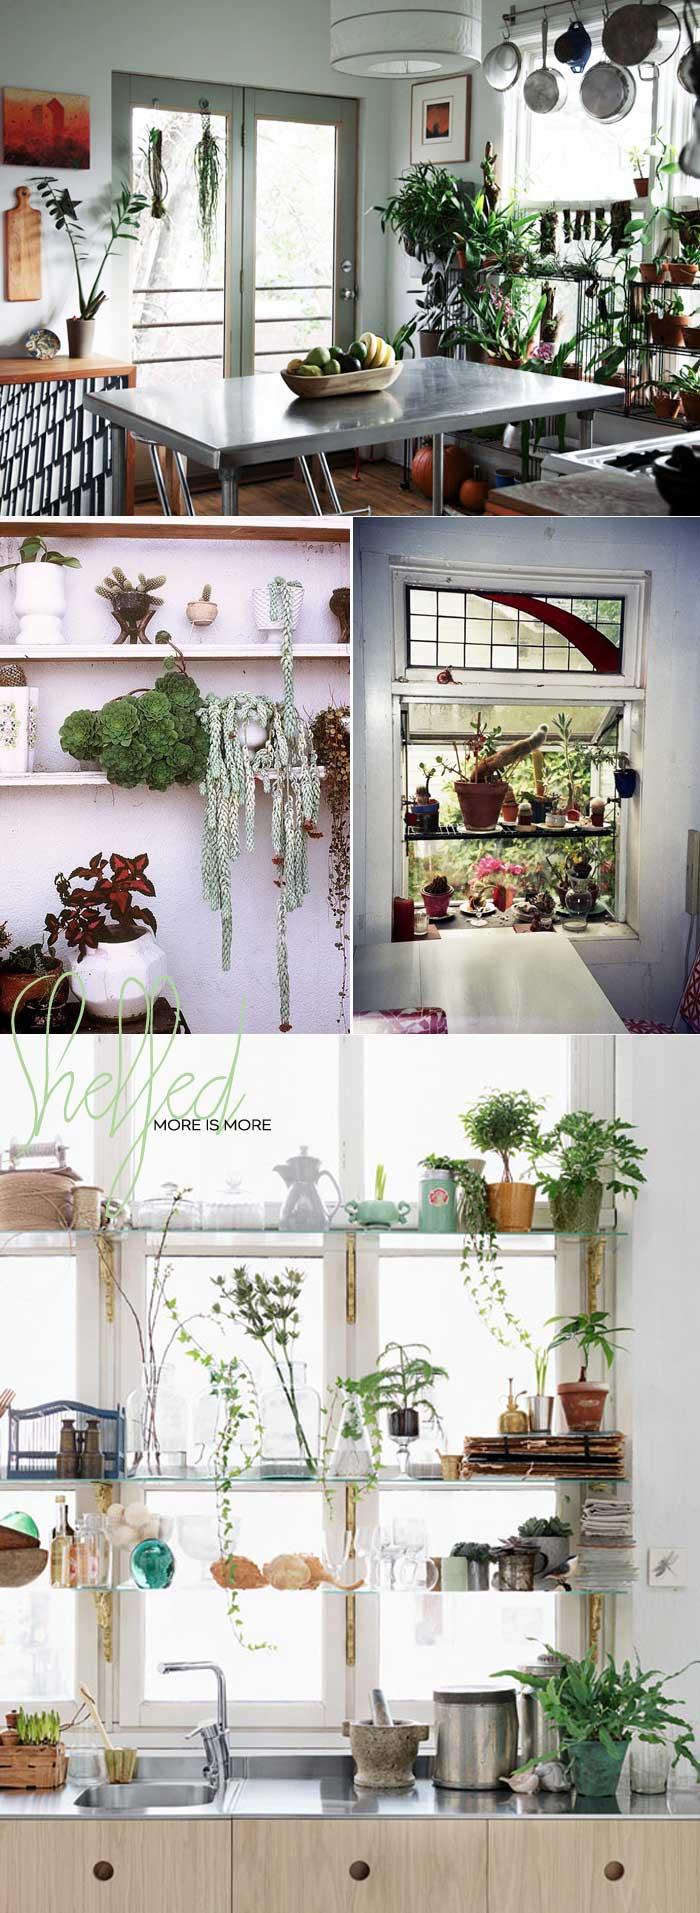 Dine-X-Design-Plants-On-Kitchen-Shelves-2